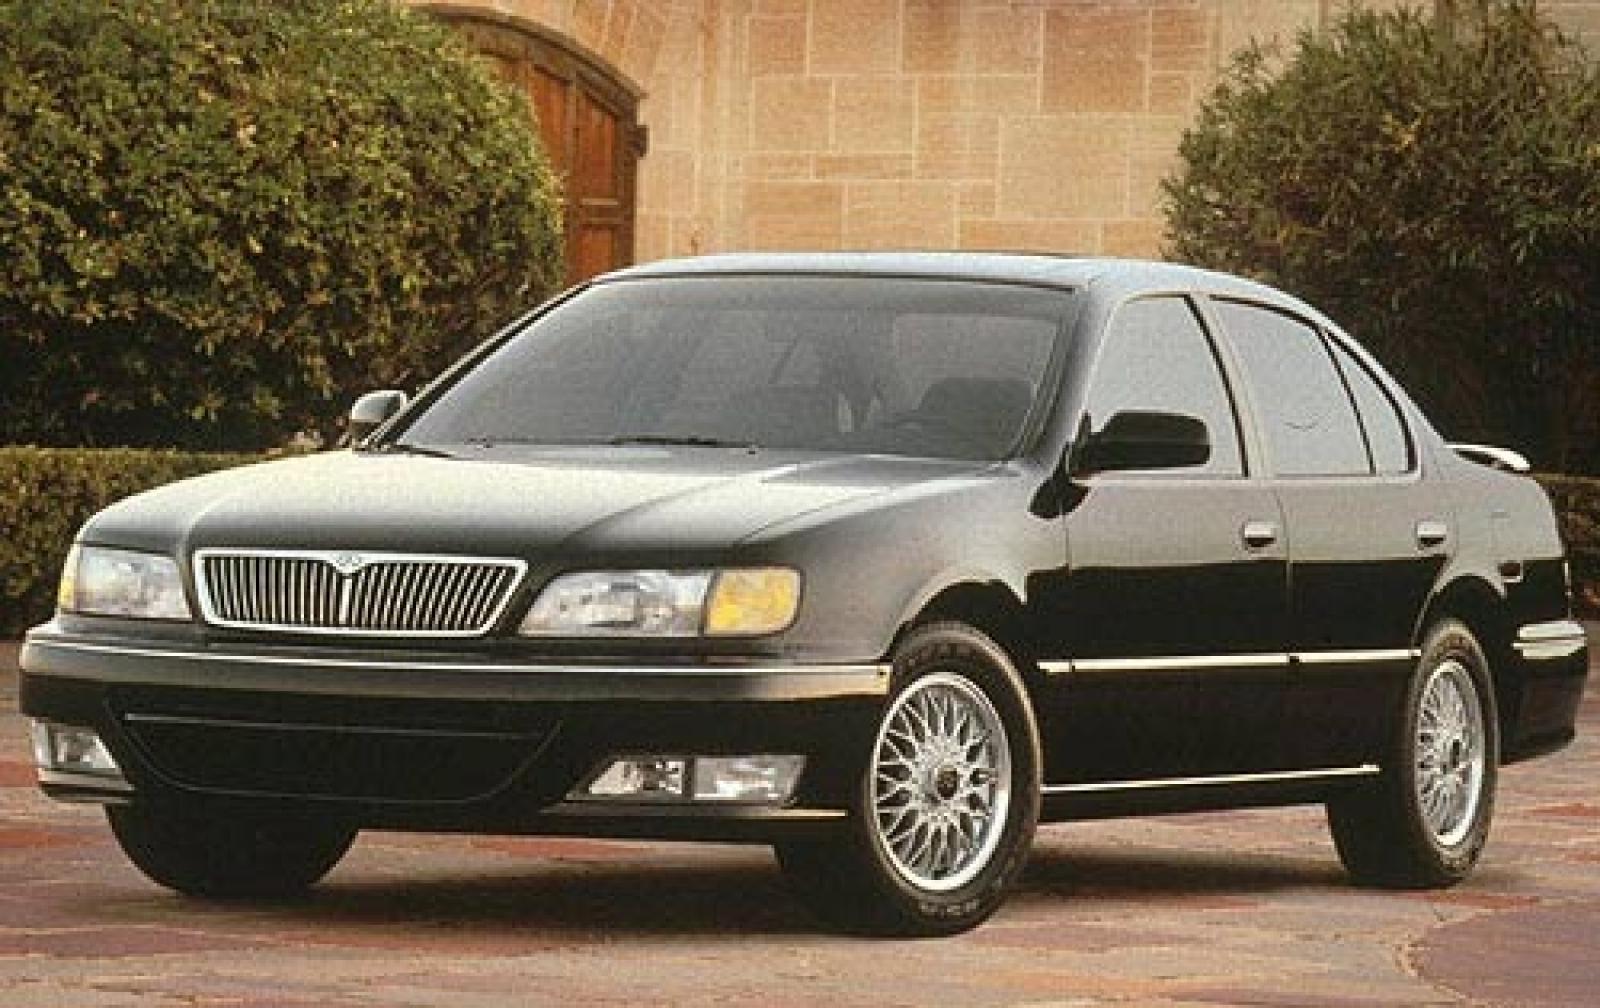 1997 Infiniti I30 #1 800 1024 1280 1600 origin